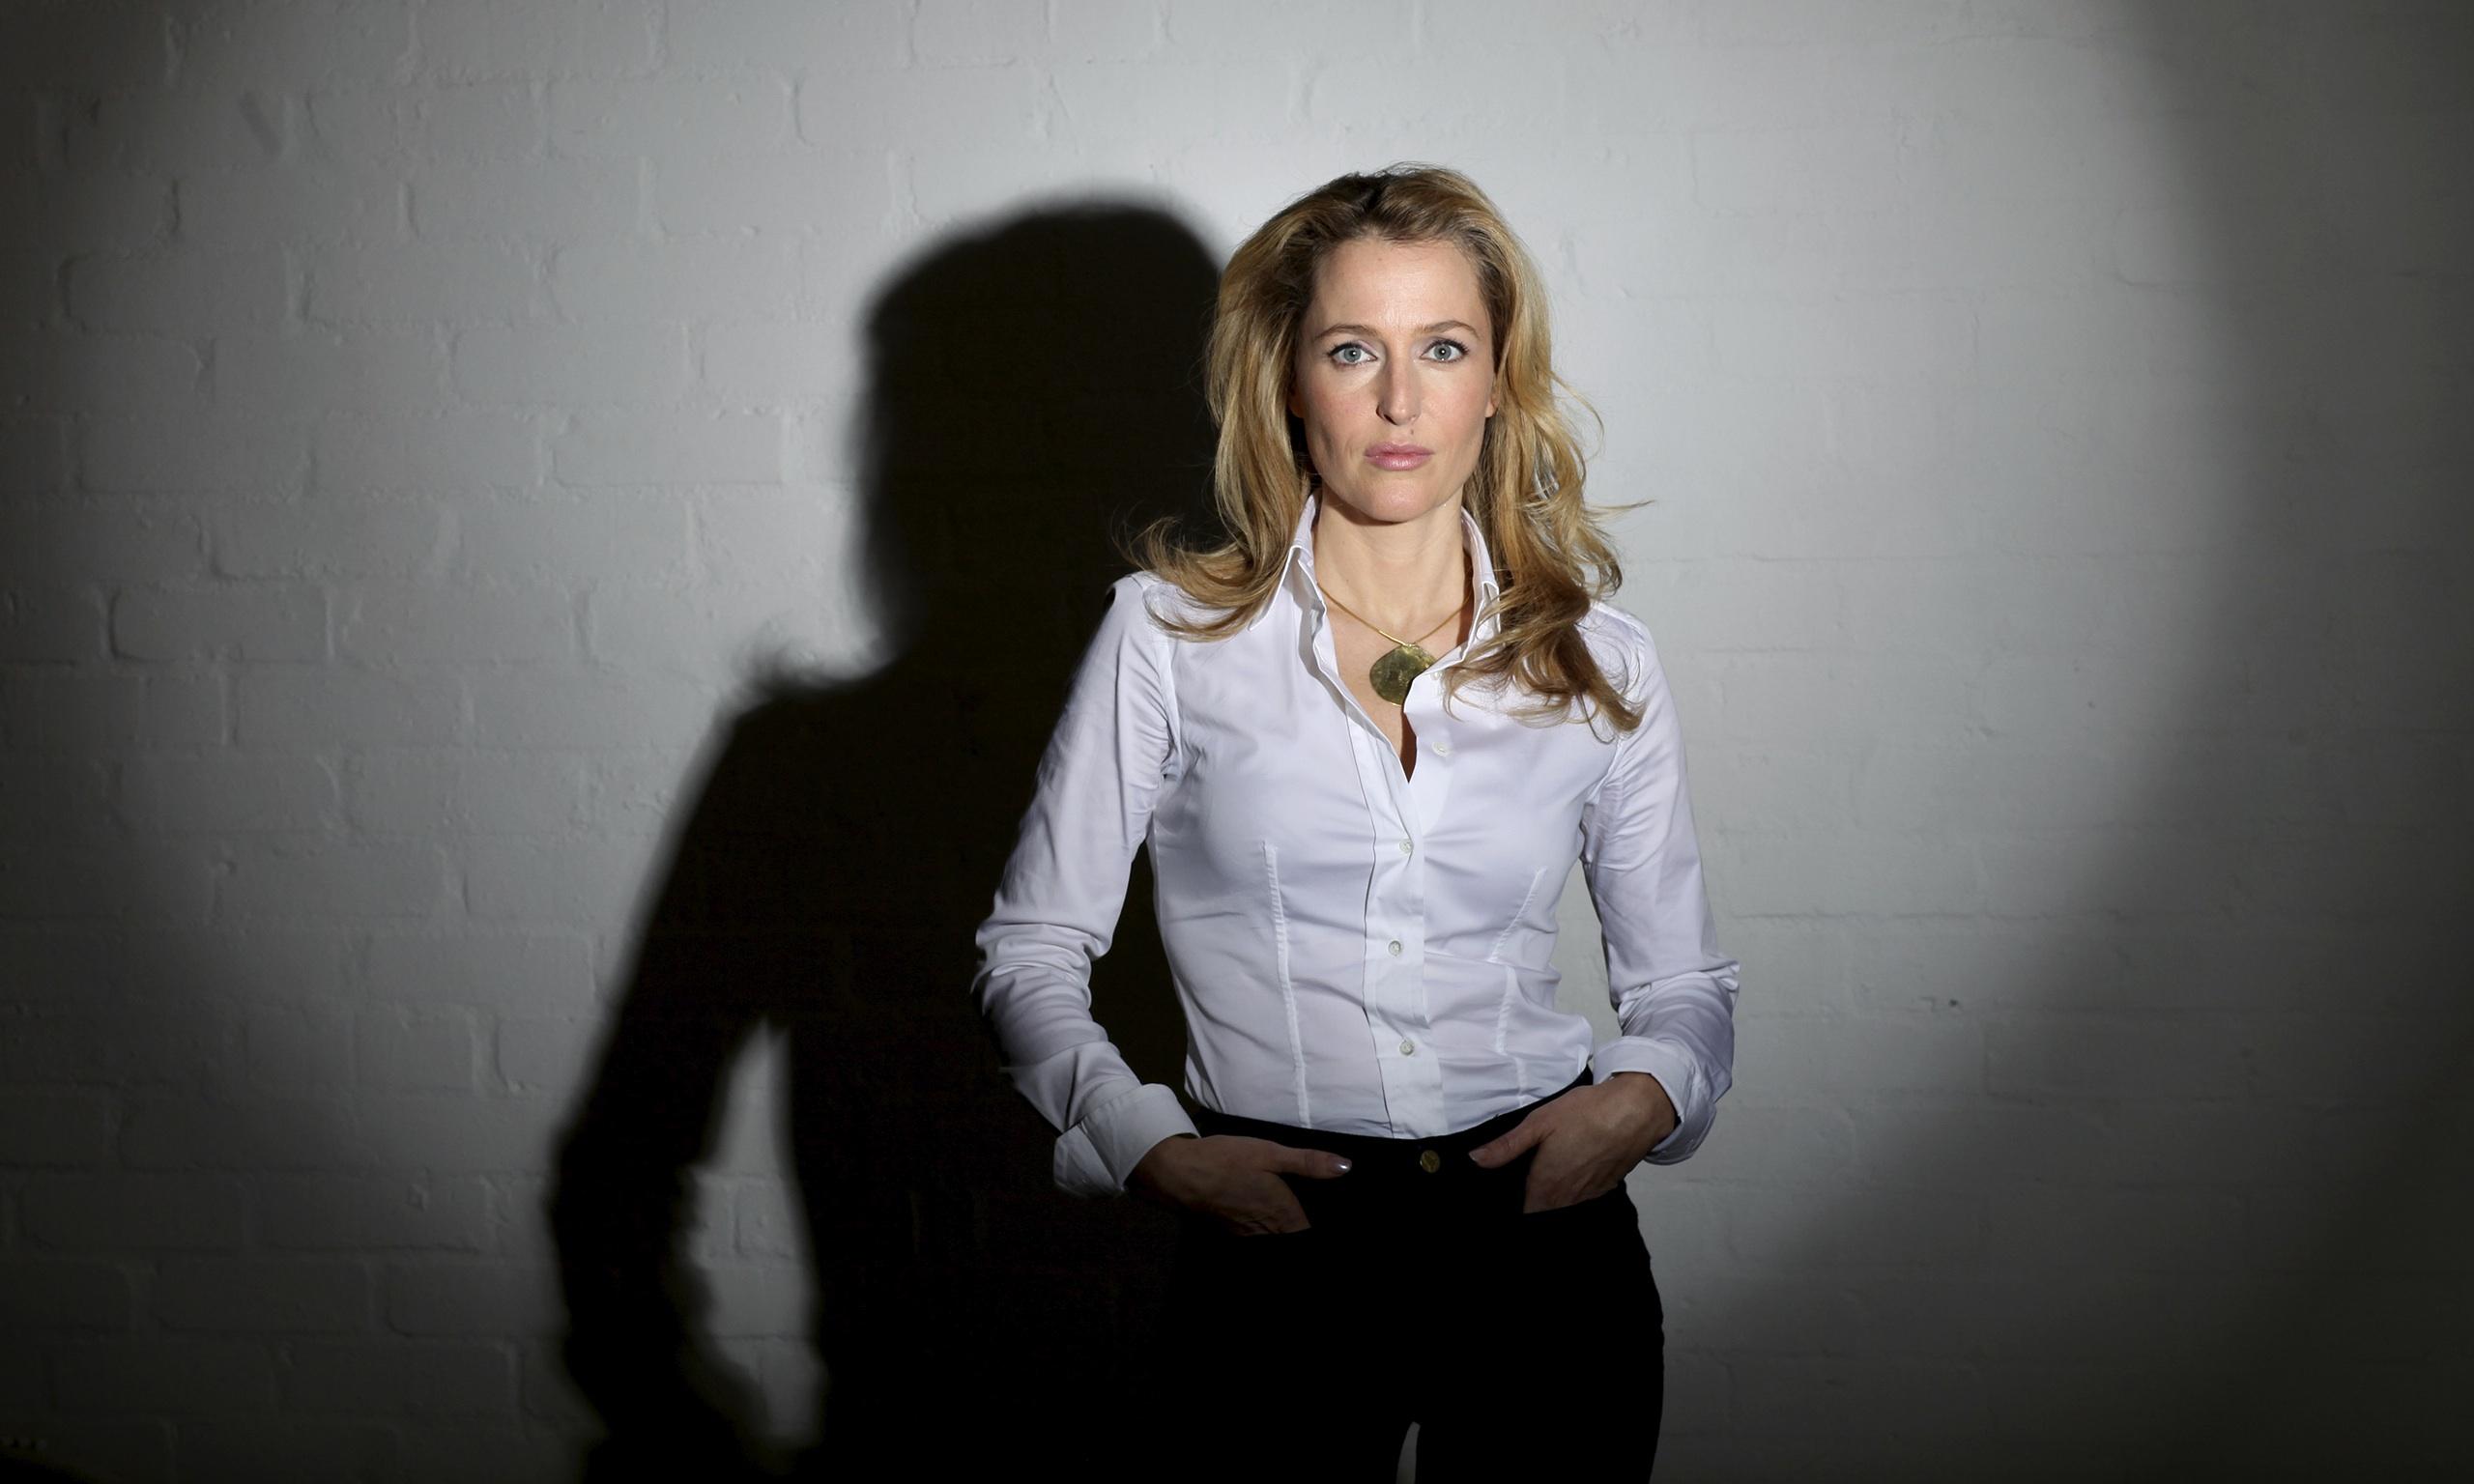 Gillian-Anderson-014.jpg